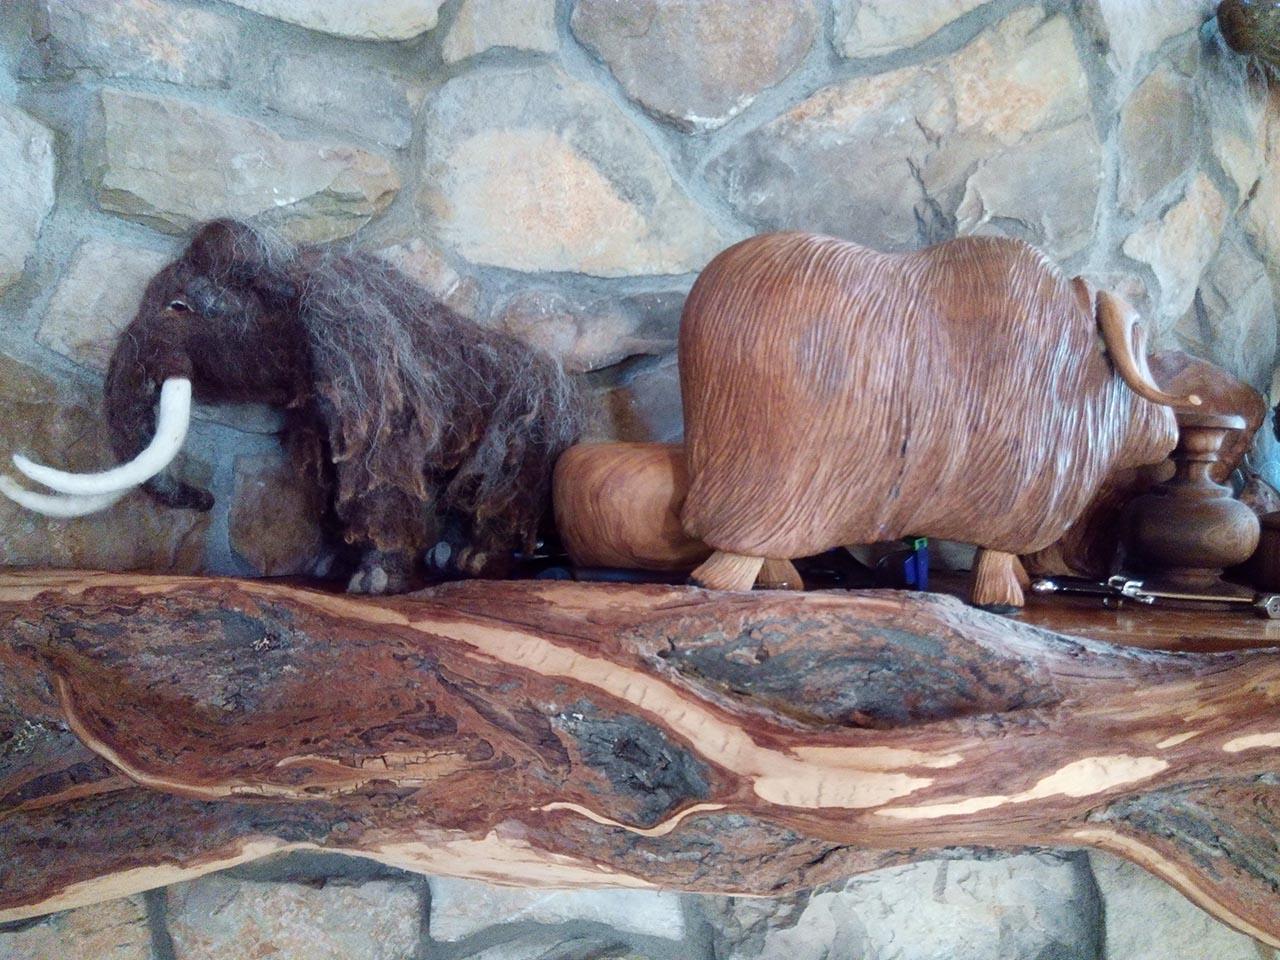 Mantle decorations - mini mammoth and yak.